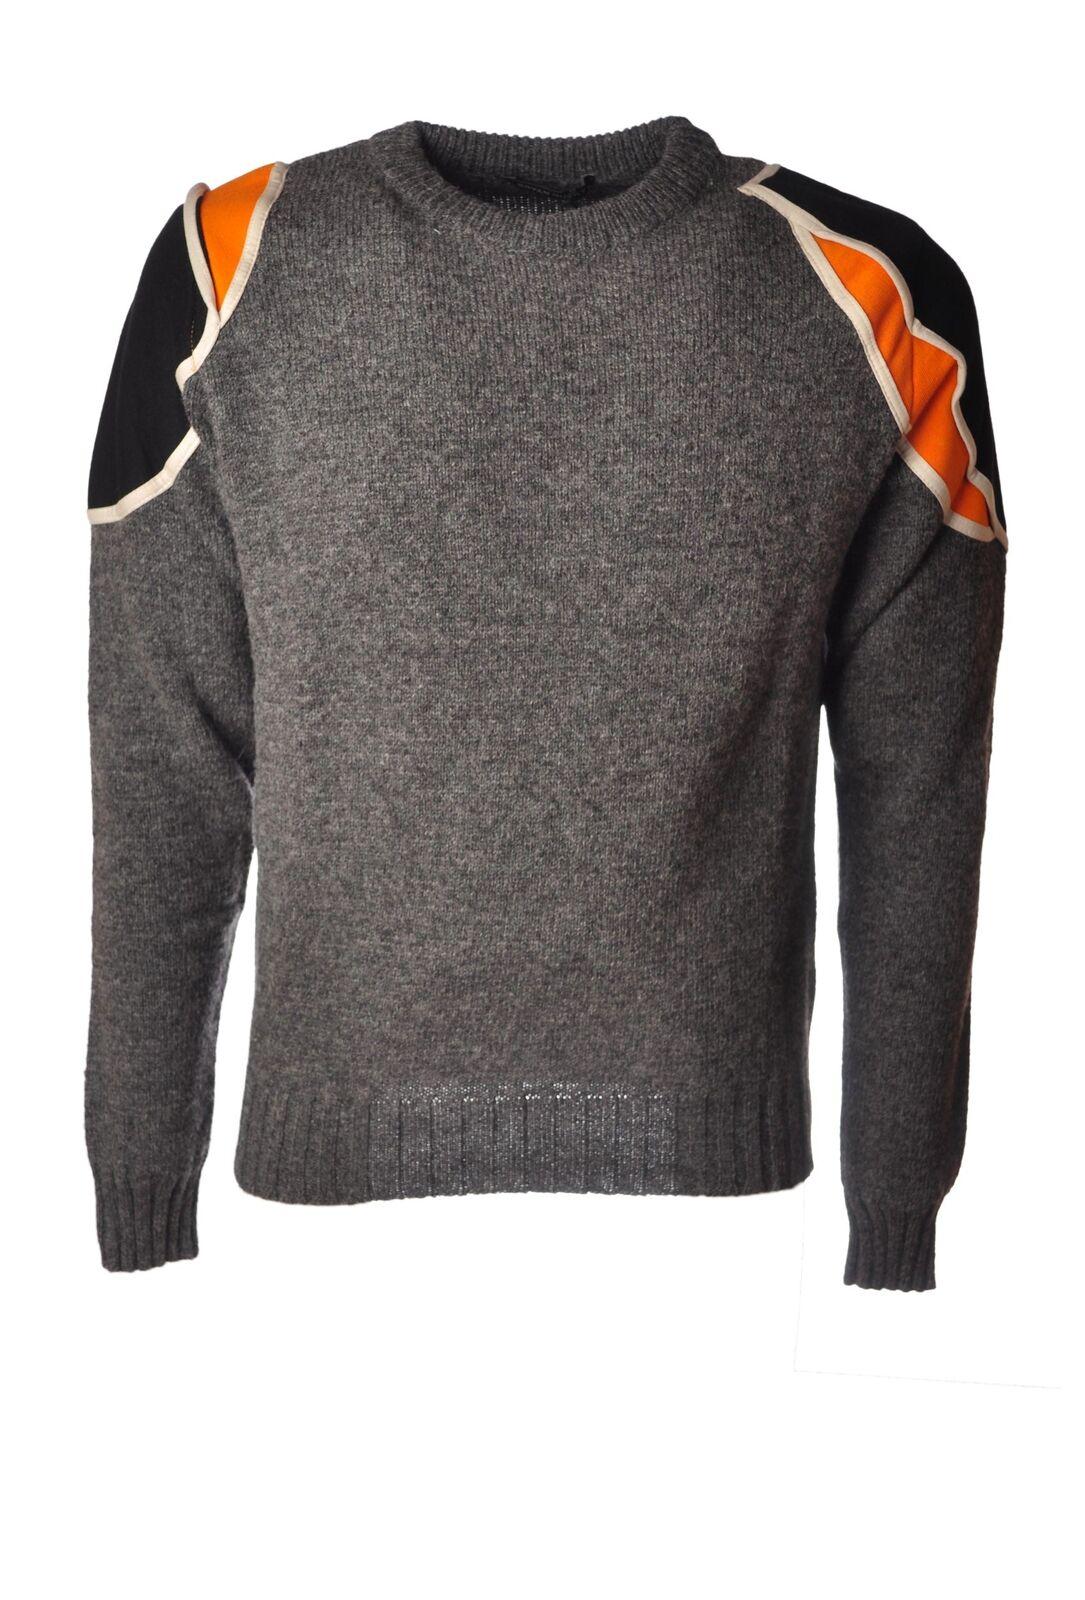 Bryan Husky  -  Sweaters - Male - Grau - 4511324A180432